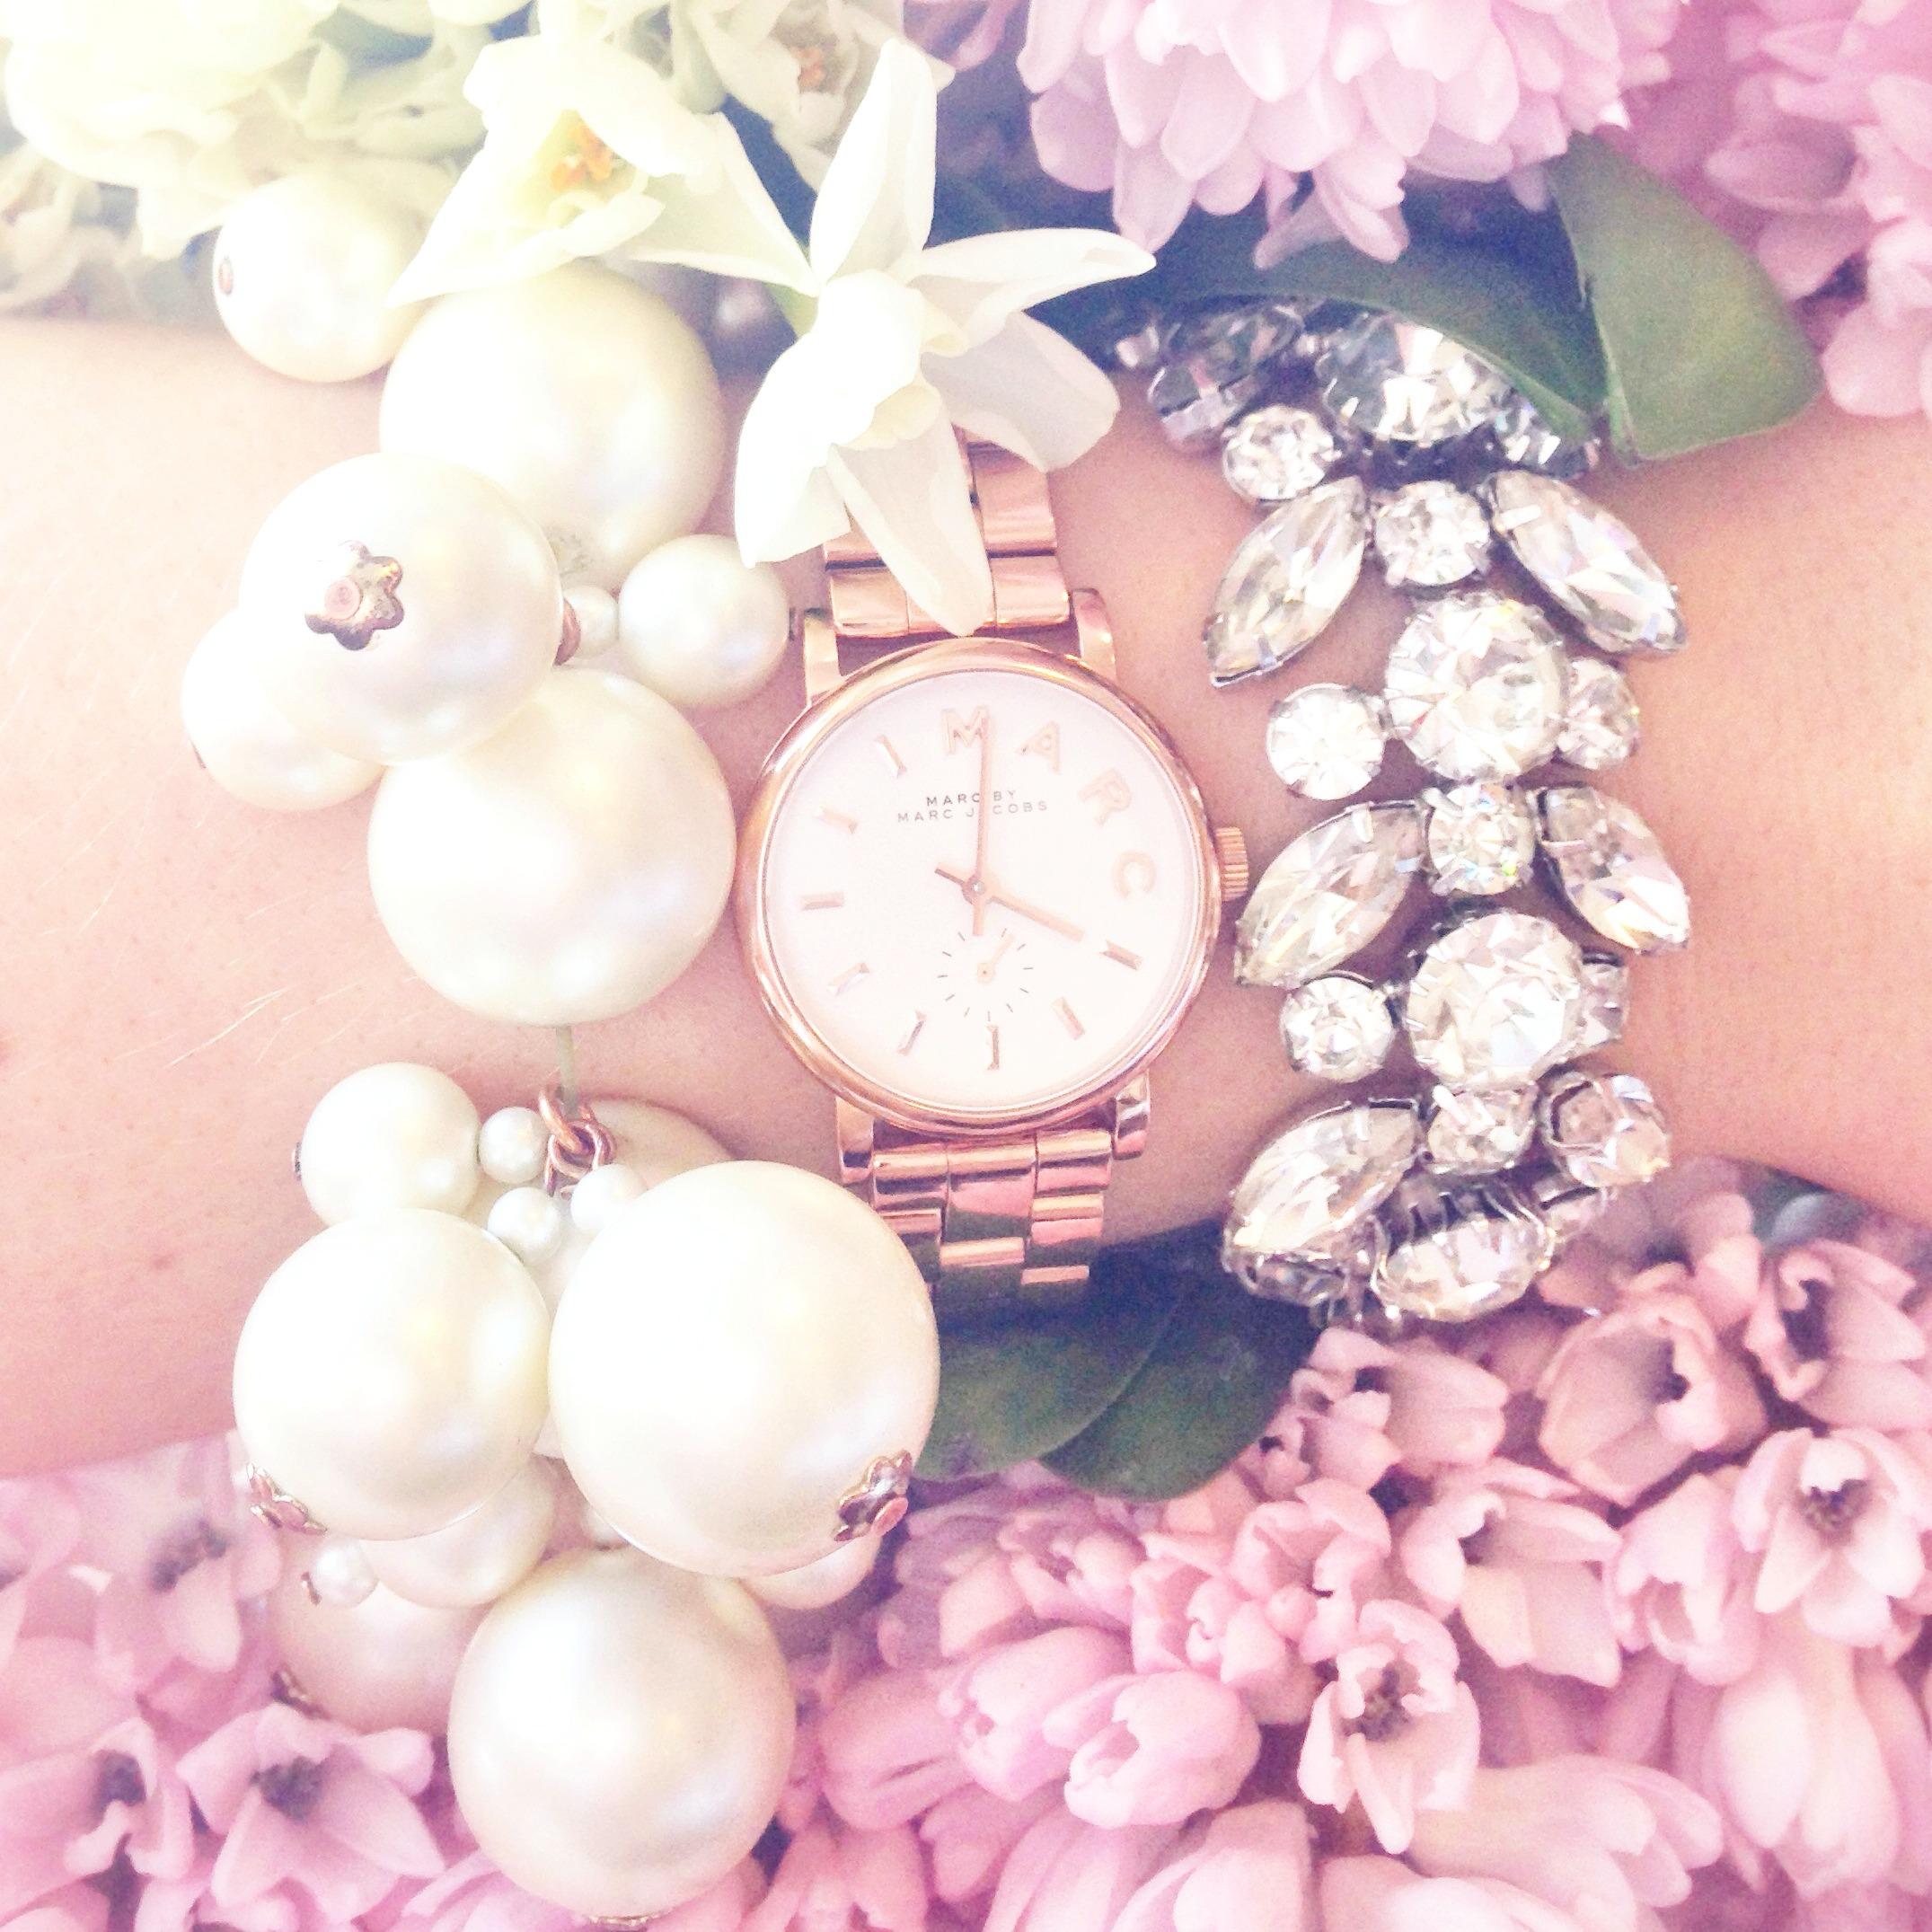 A Girl, A Style _ Spring Forward